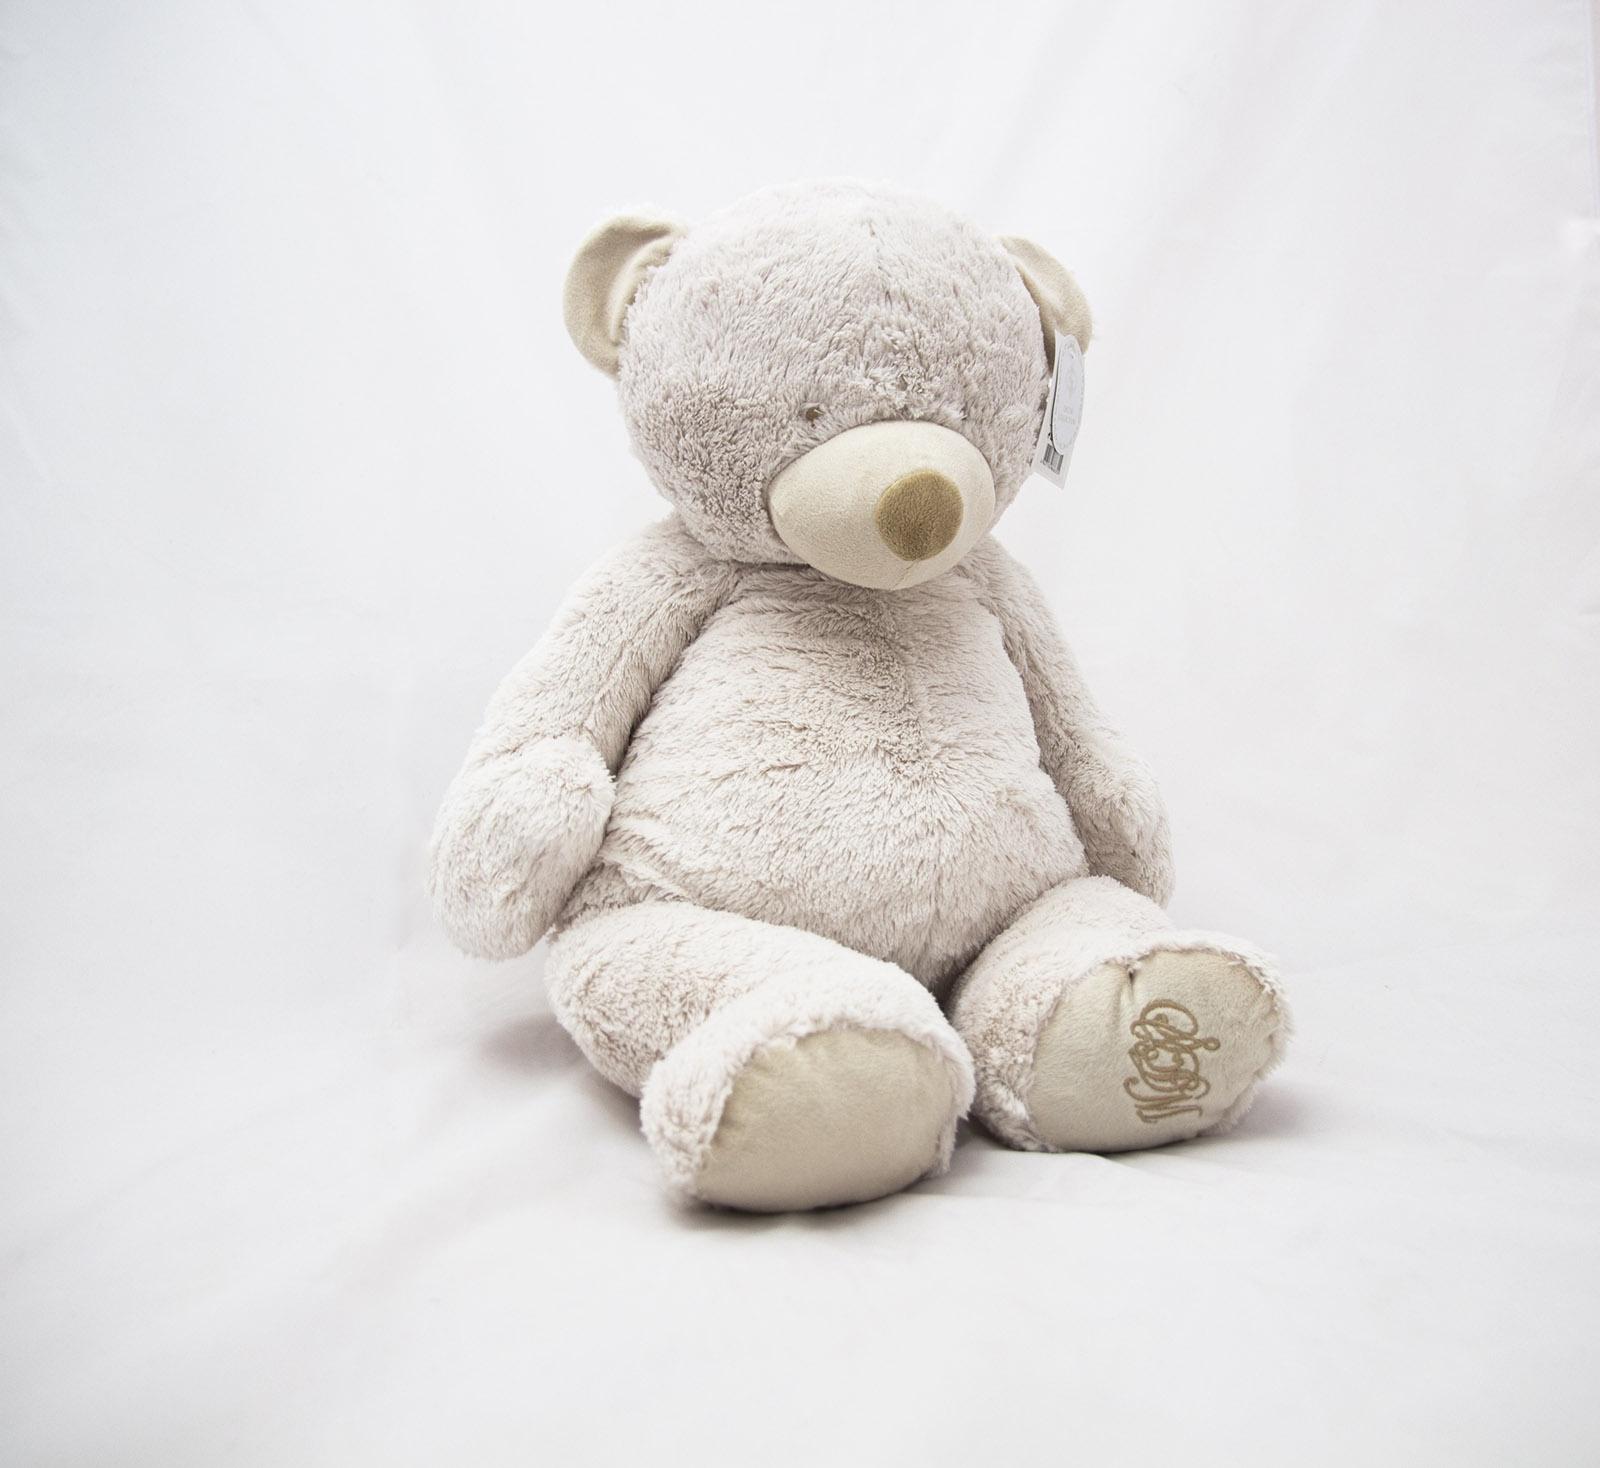 Фото - Мягкая игрушка Sofi de Marko Teddy Bear, М-И-2, бежевый, 60 х 25 см удочка зимняя swd ice bear 60 см